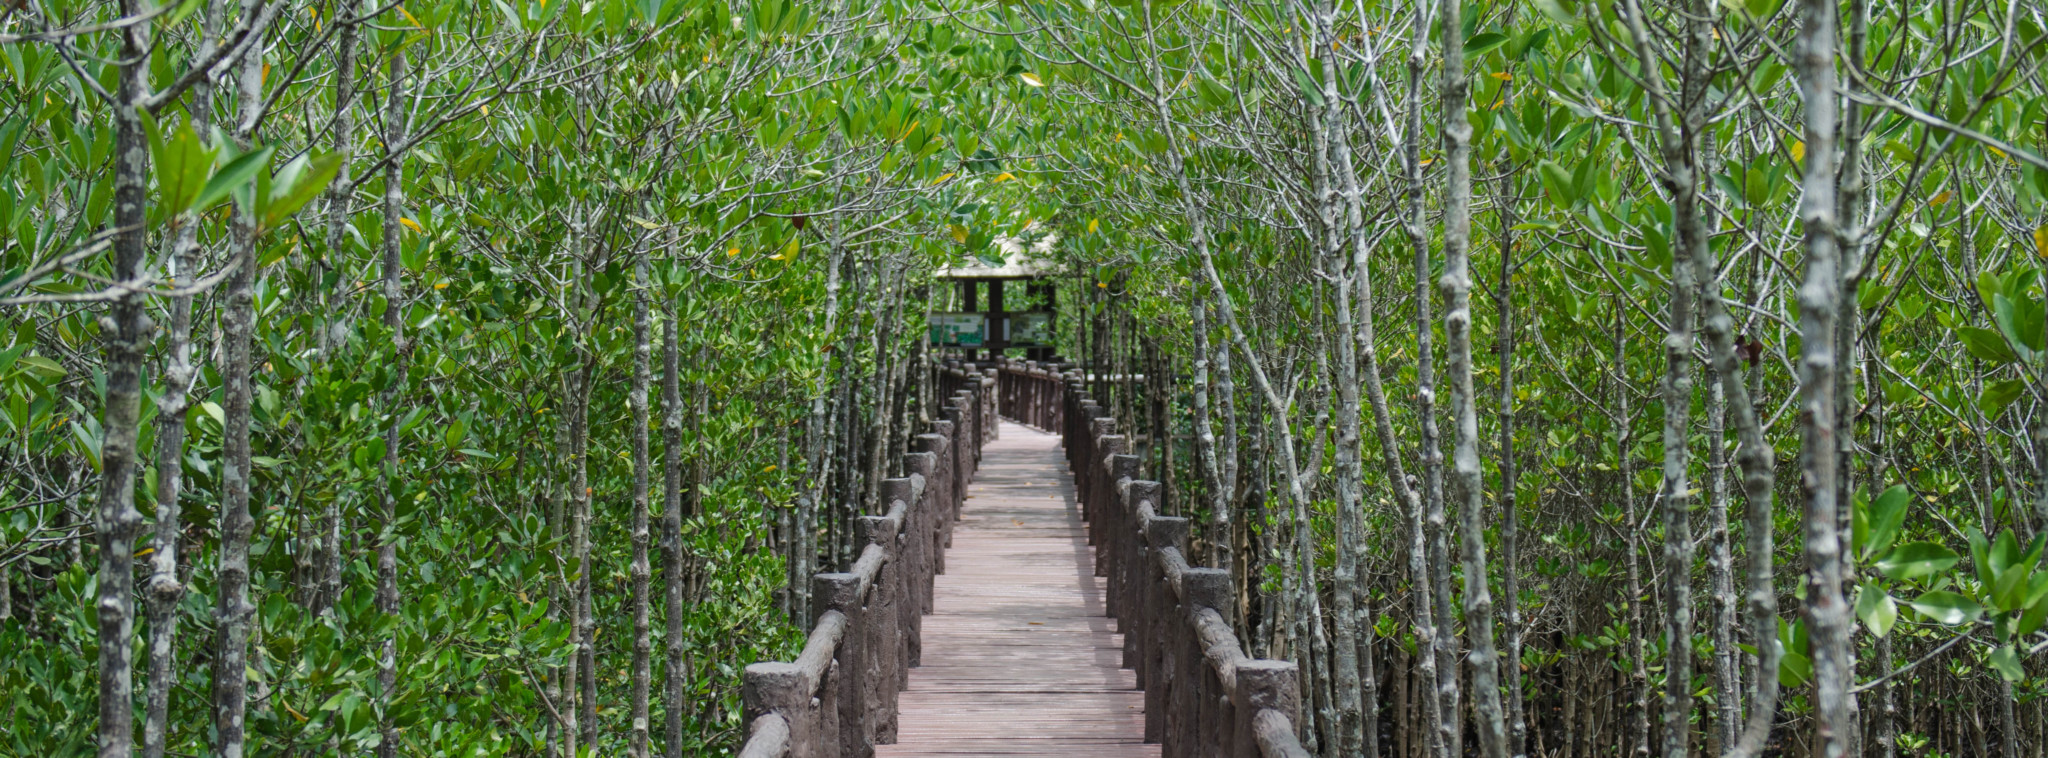 Chumphon Sehenswürdigkeiten Holzbrücke